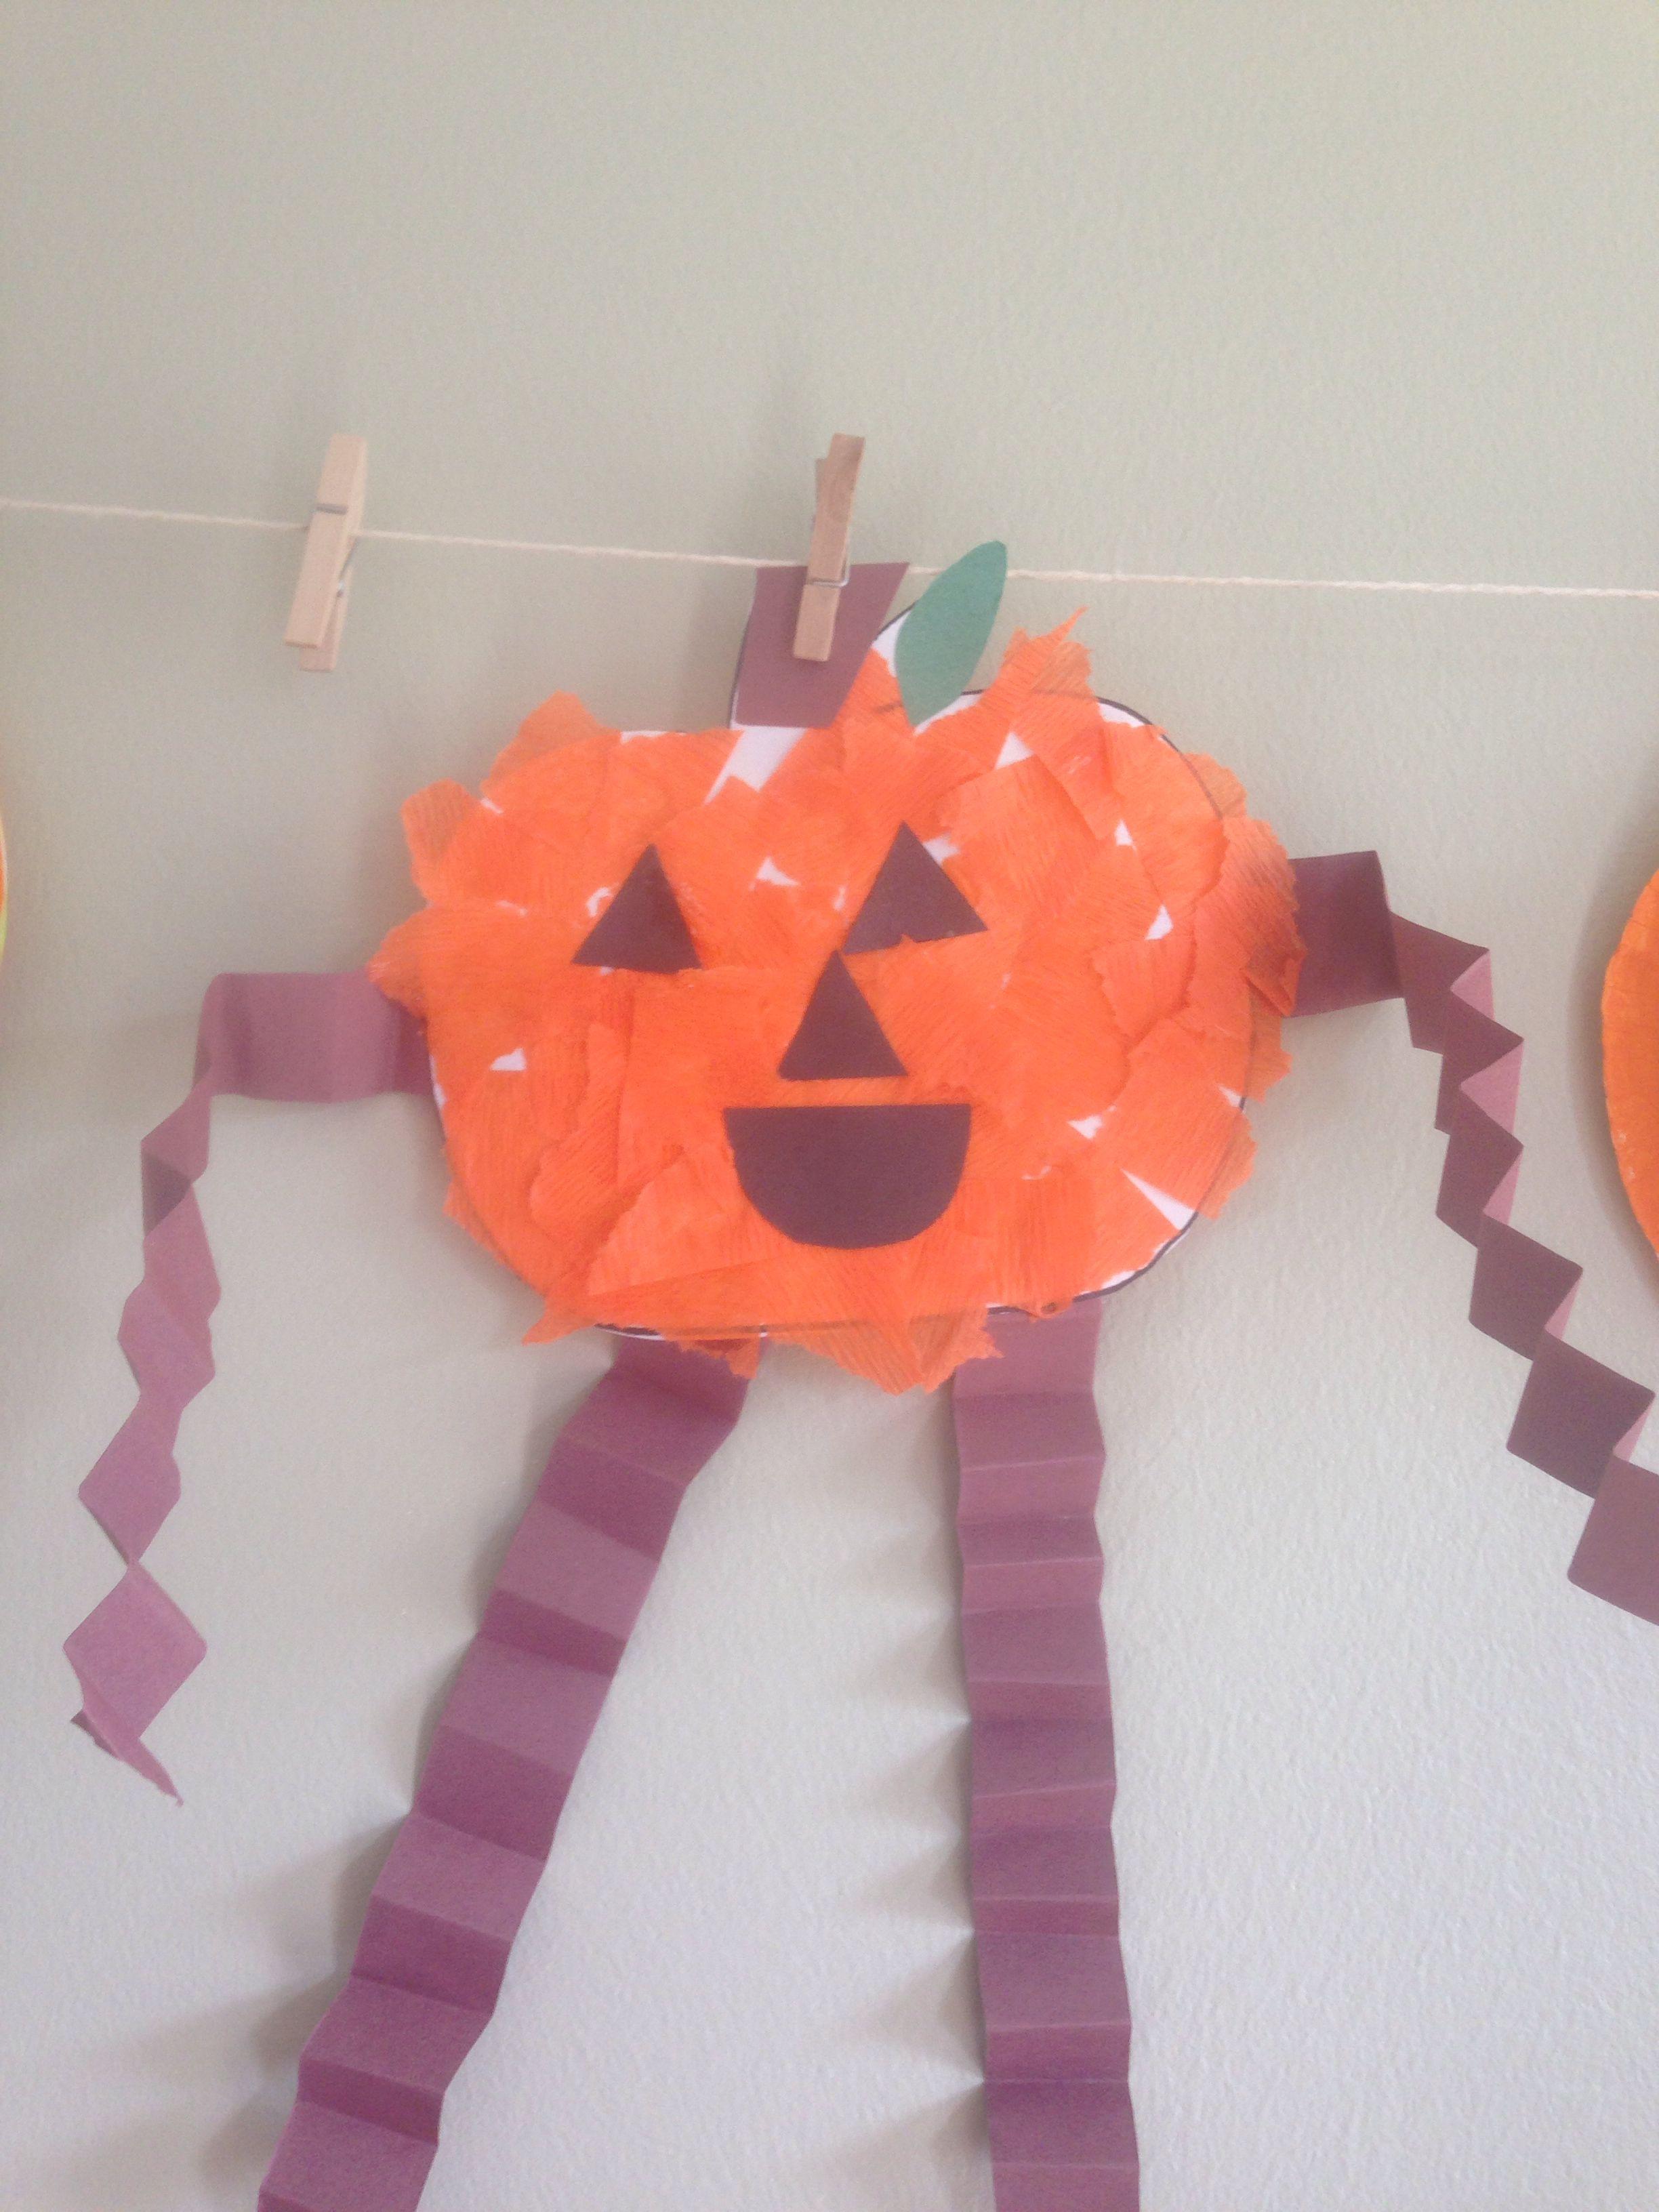 Pumpkin man for preschool fall preschool crafts pinterest for Fall crafts for preschoolers pinterest